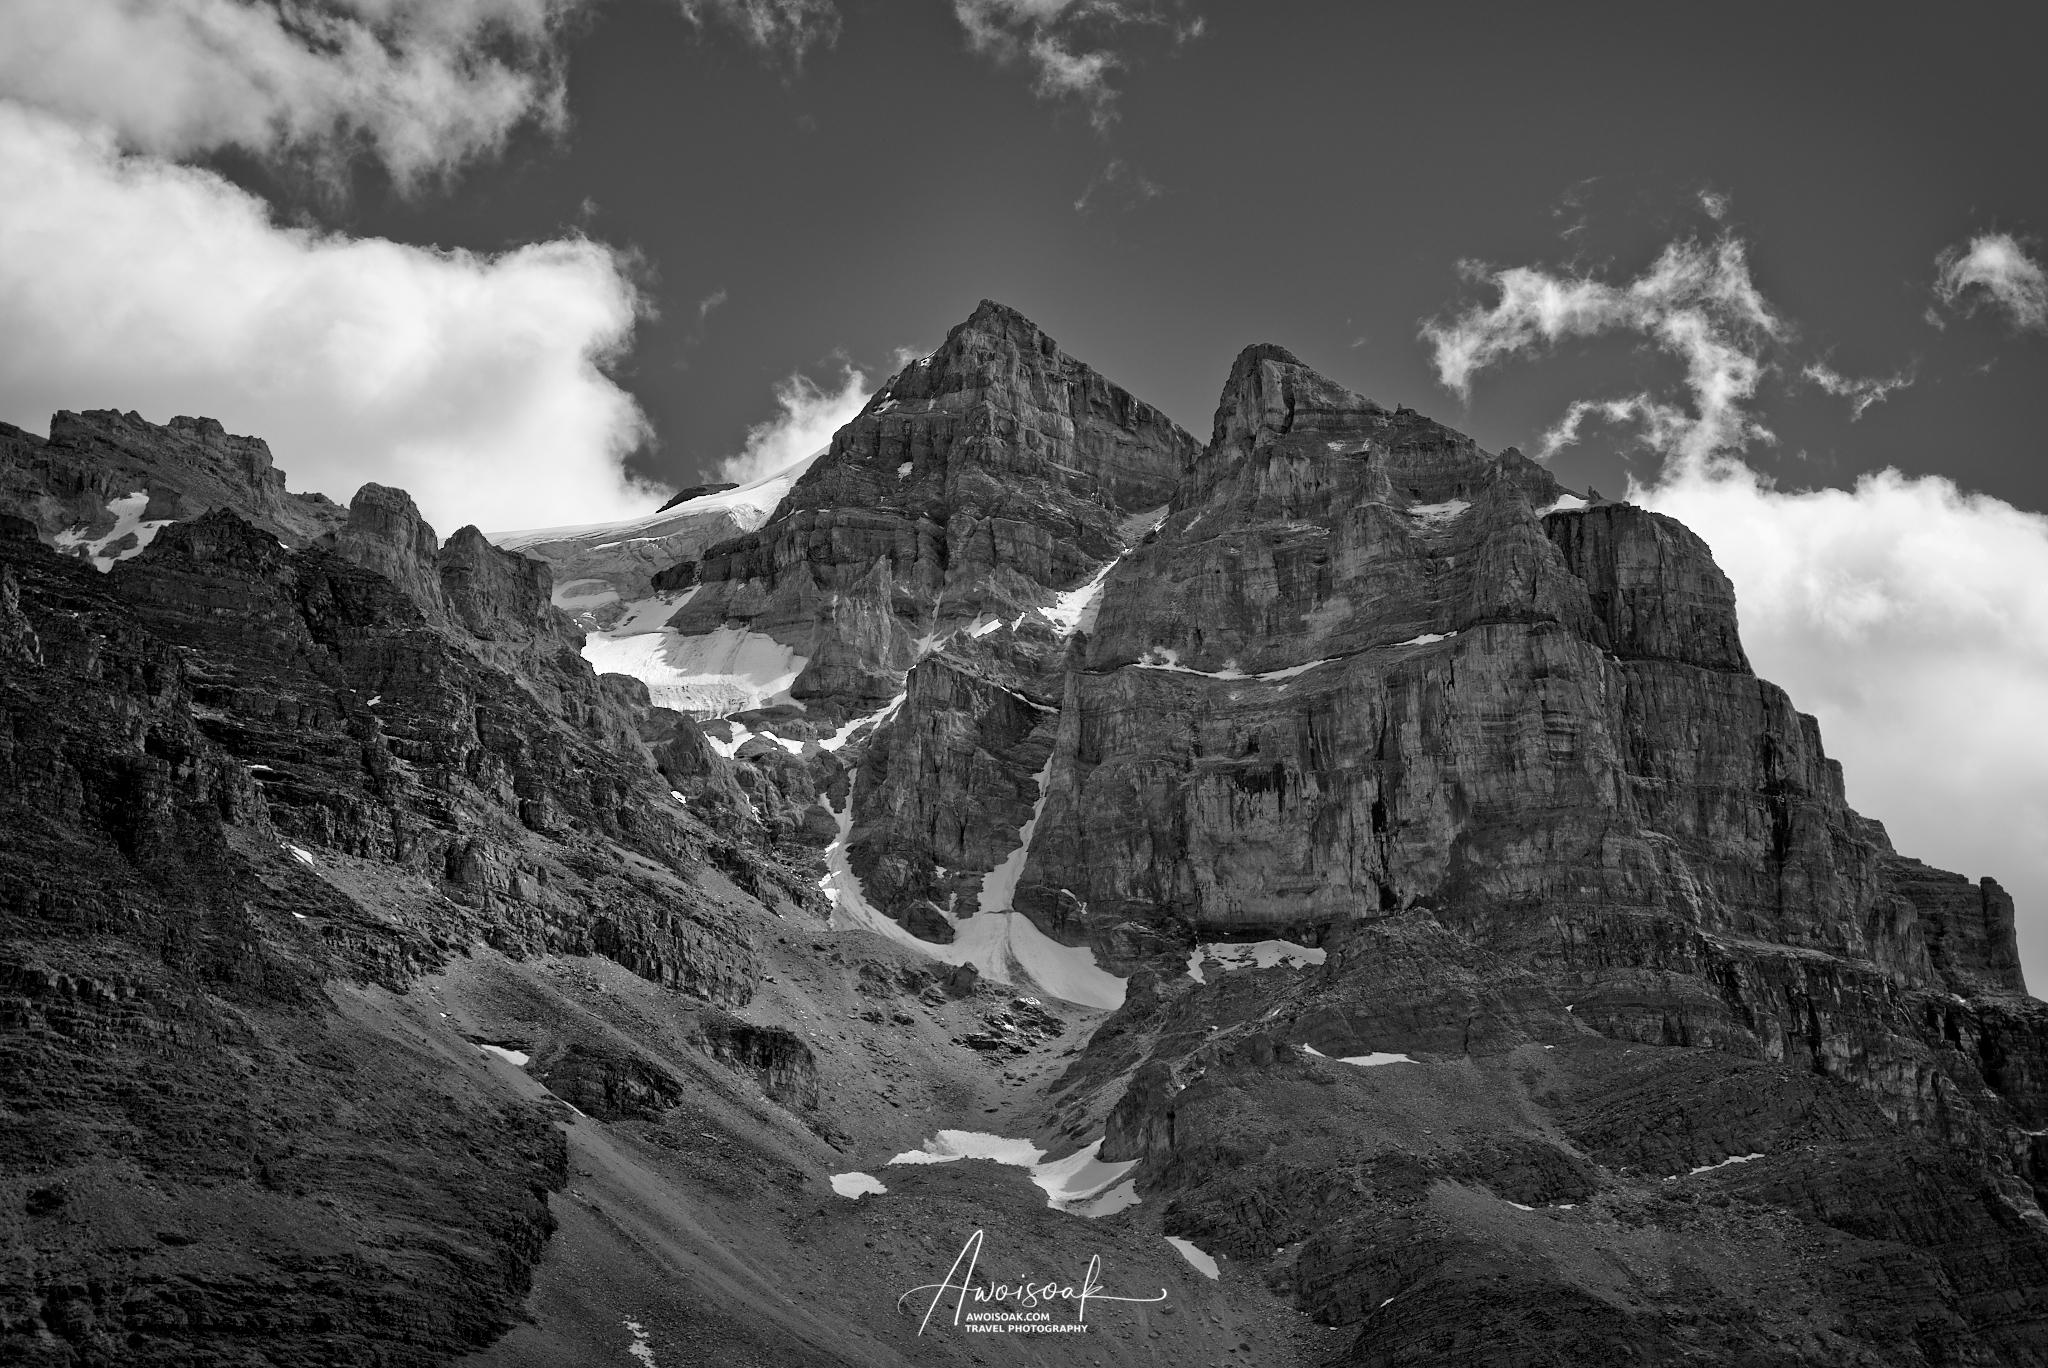 Haddo Peak, Canada